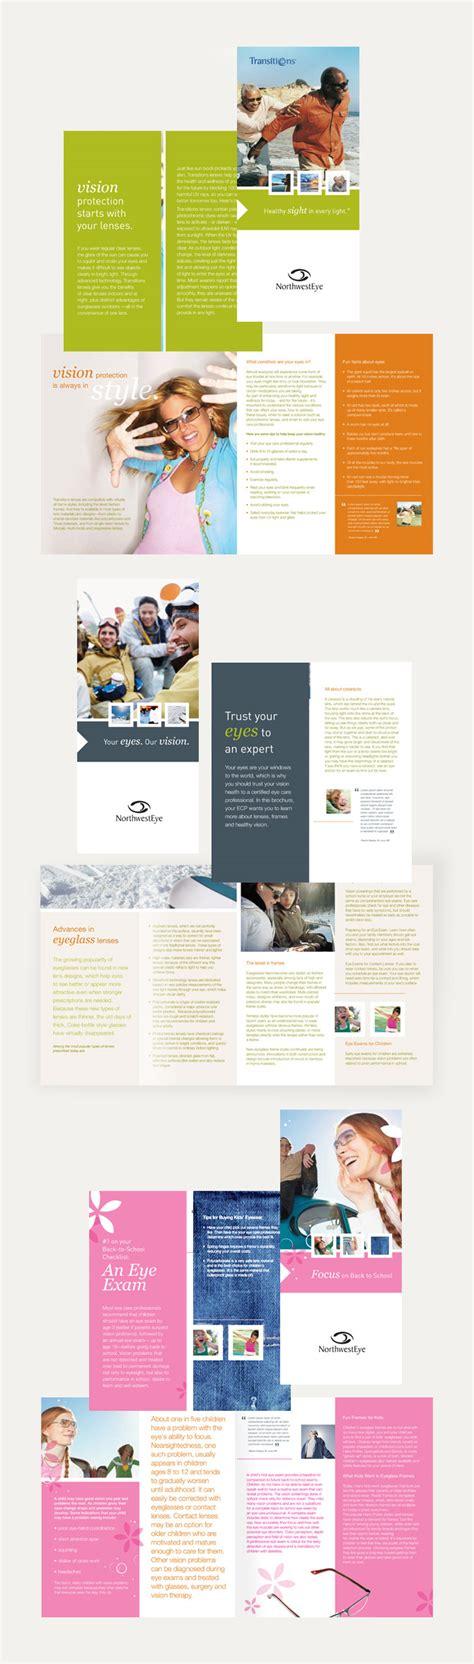 4 Fold Brochure Template Word Brickhost Cd8e1a85bc37 El Robinson Engineering Brochure Brochure T Brochures